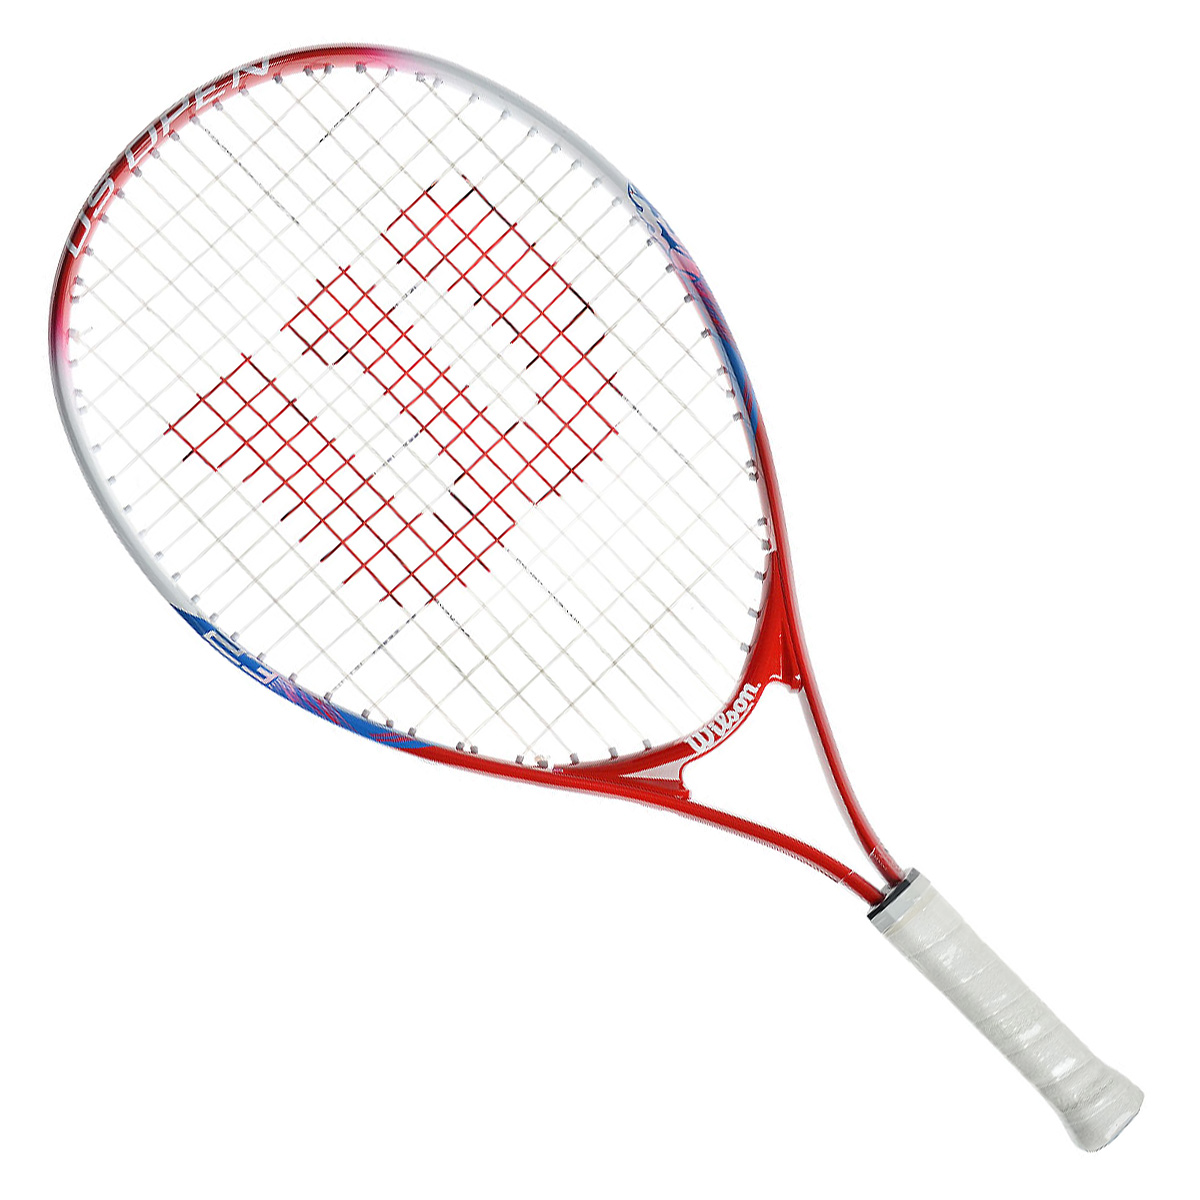 Ракетка детская Wilson US Open 23 теннисная ракетка prince t361 o3 tour os